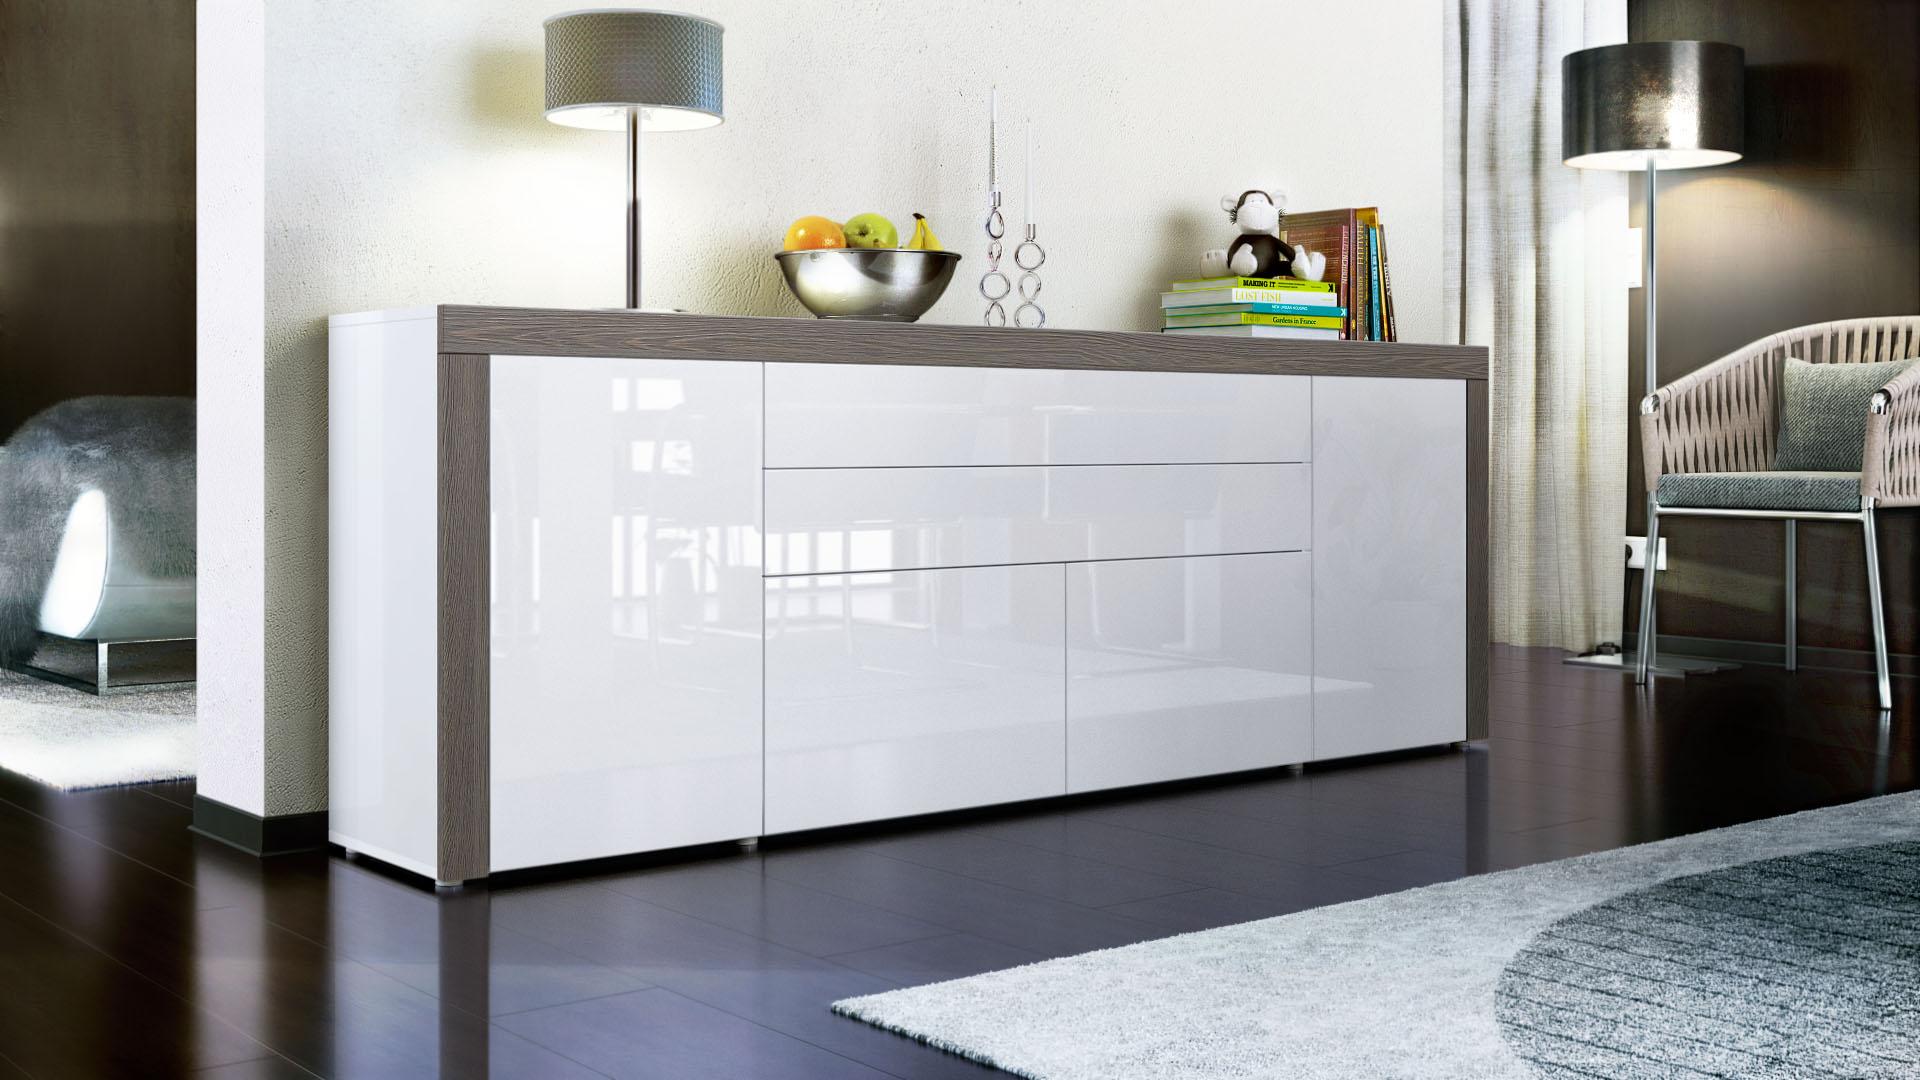 sideboard kommode anrichte highboard la paz v2 in wei hochglanz naturt ne ebay. Black Bedroom Furniture Sets. Home Design Ideas